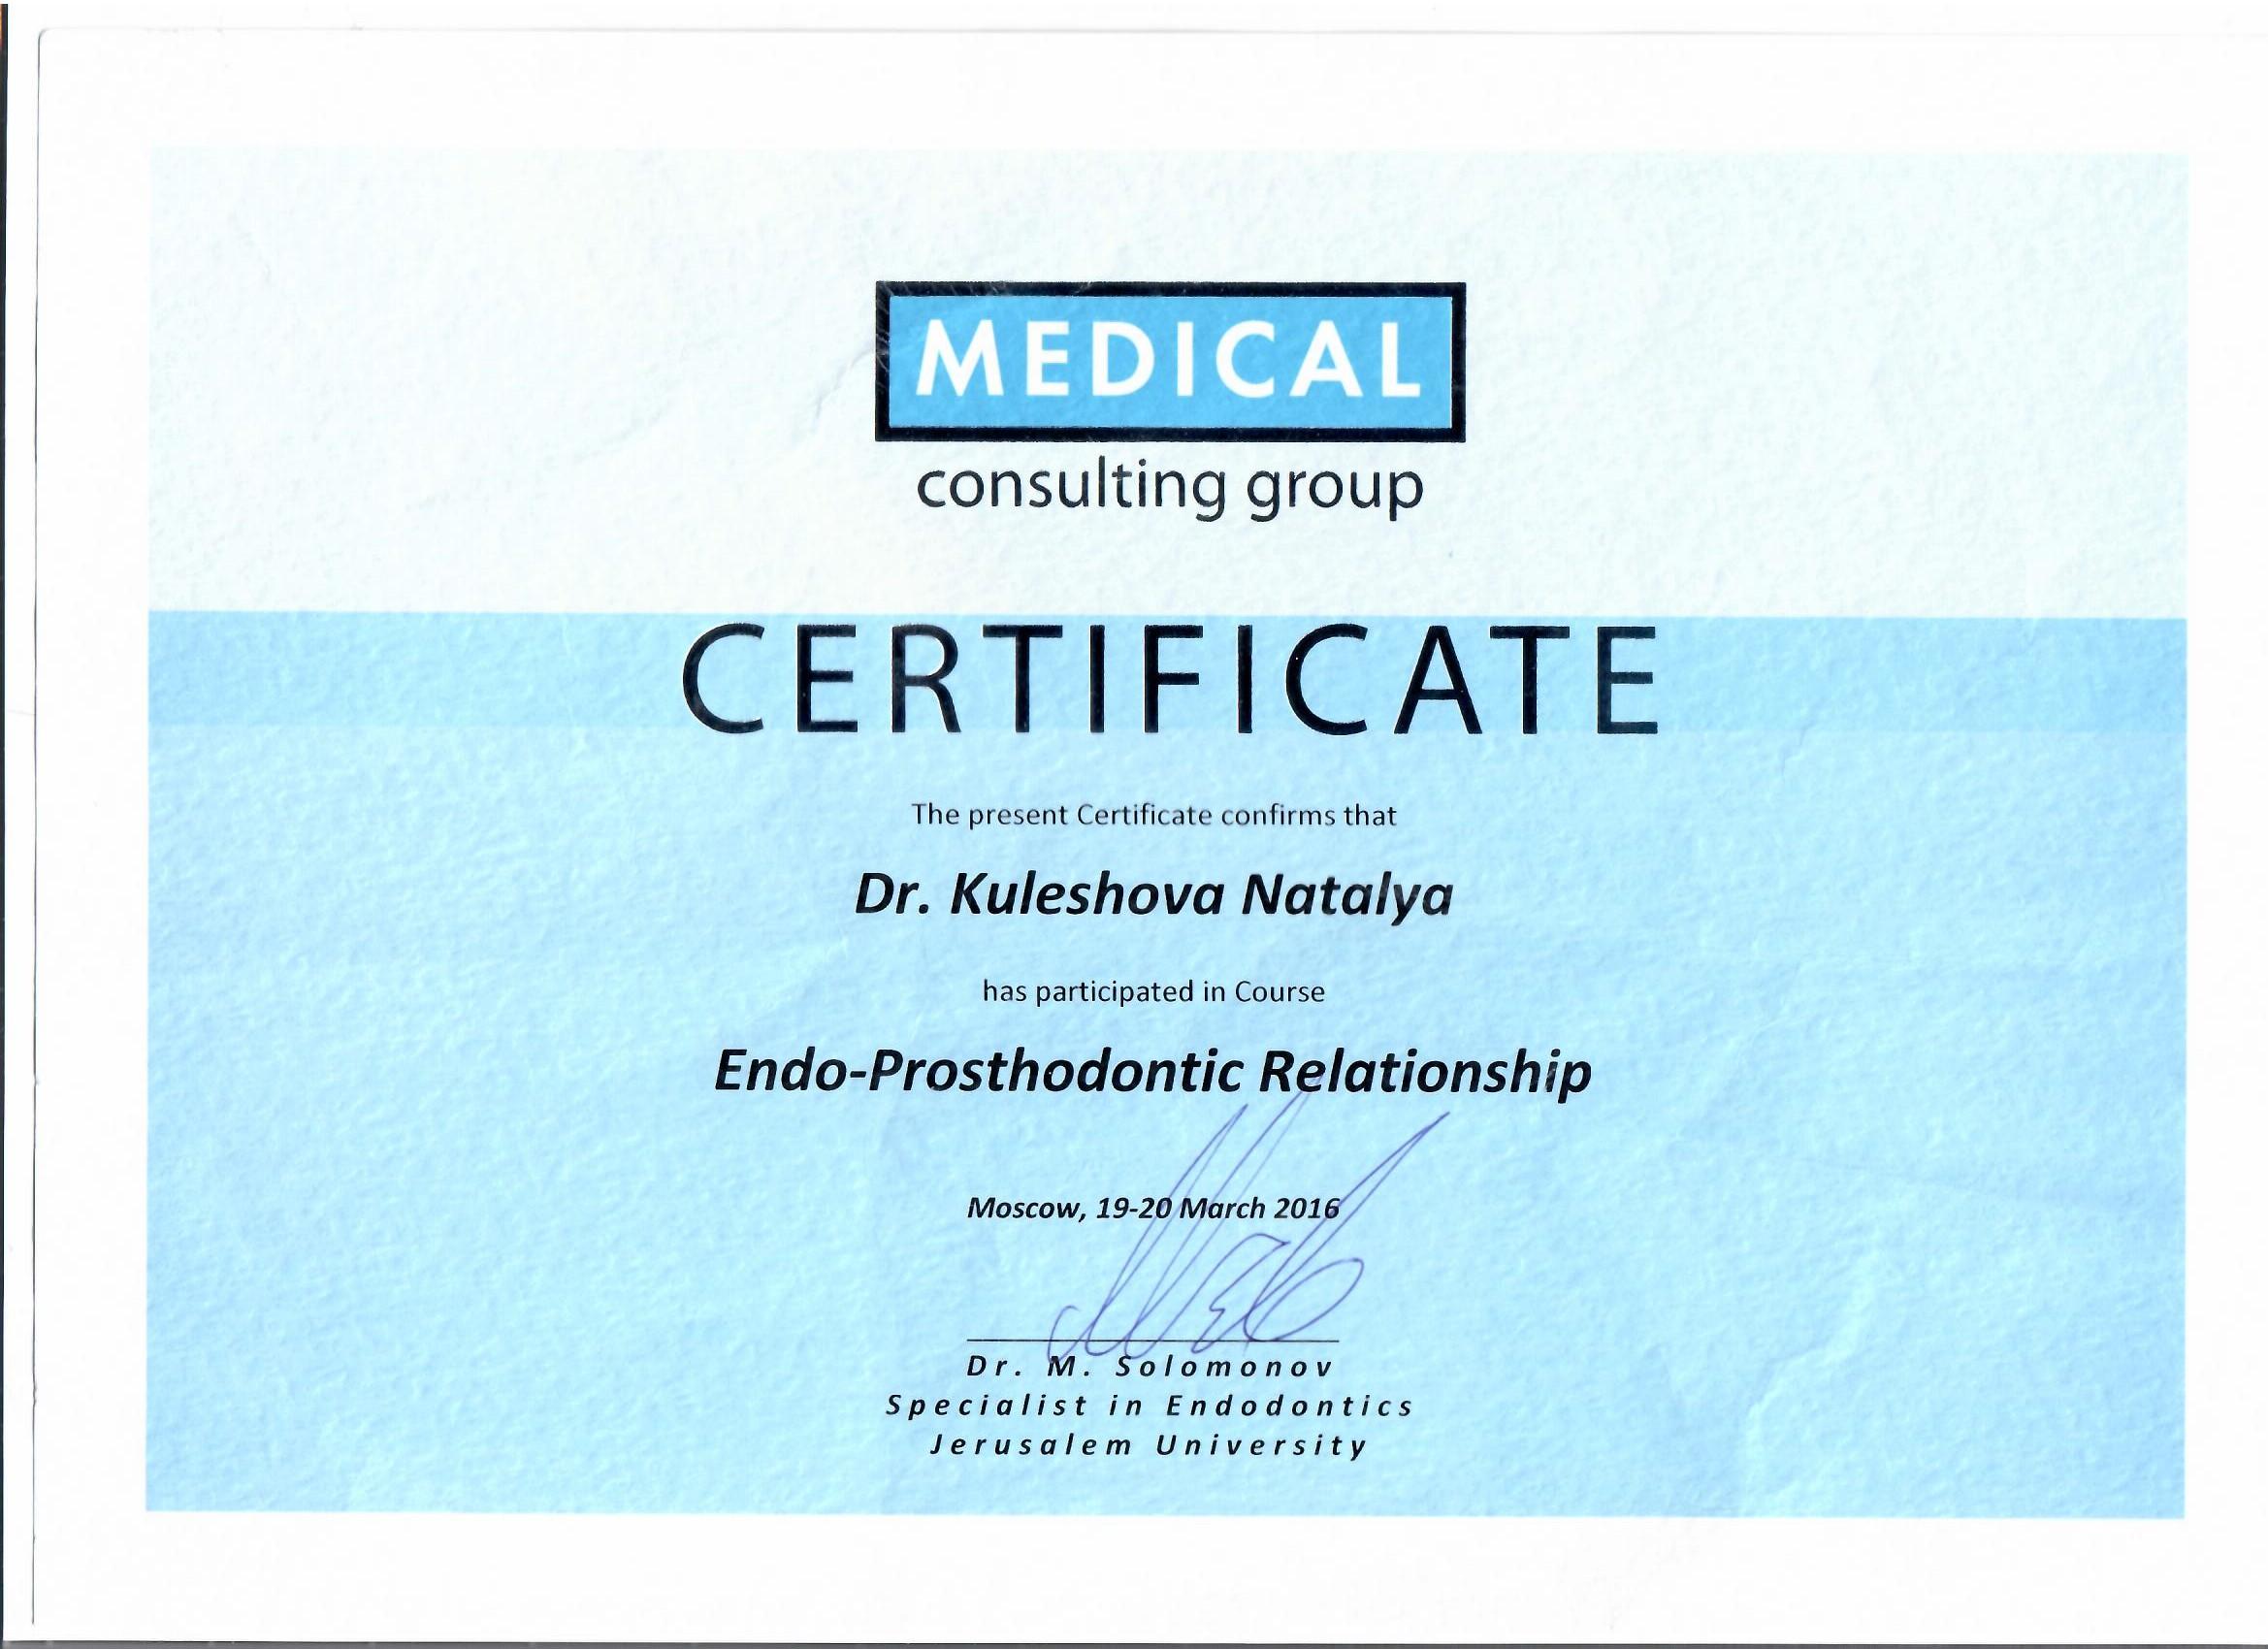 2016 Endo-Prosthodontic Relationship